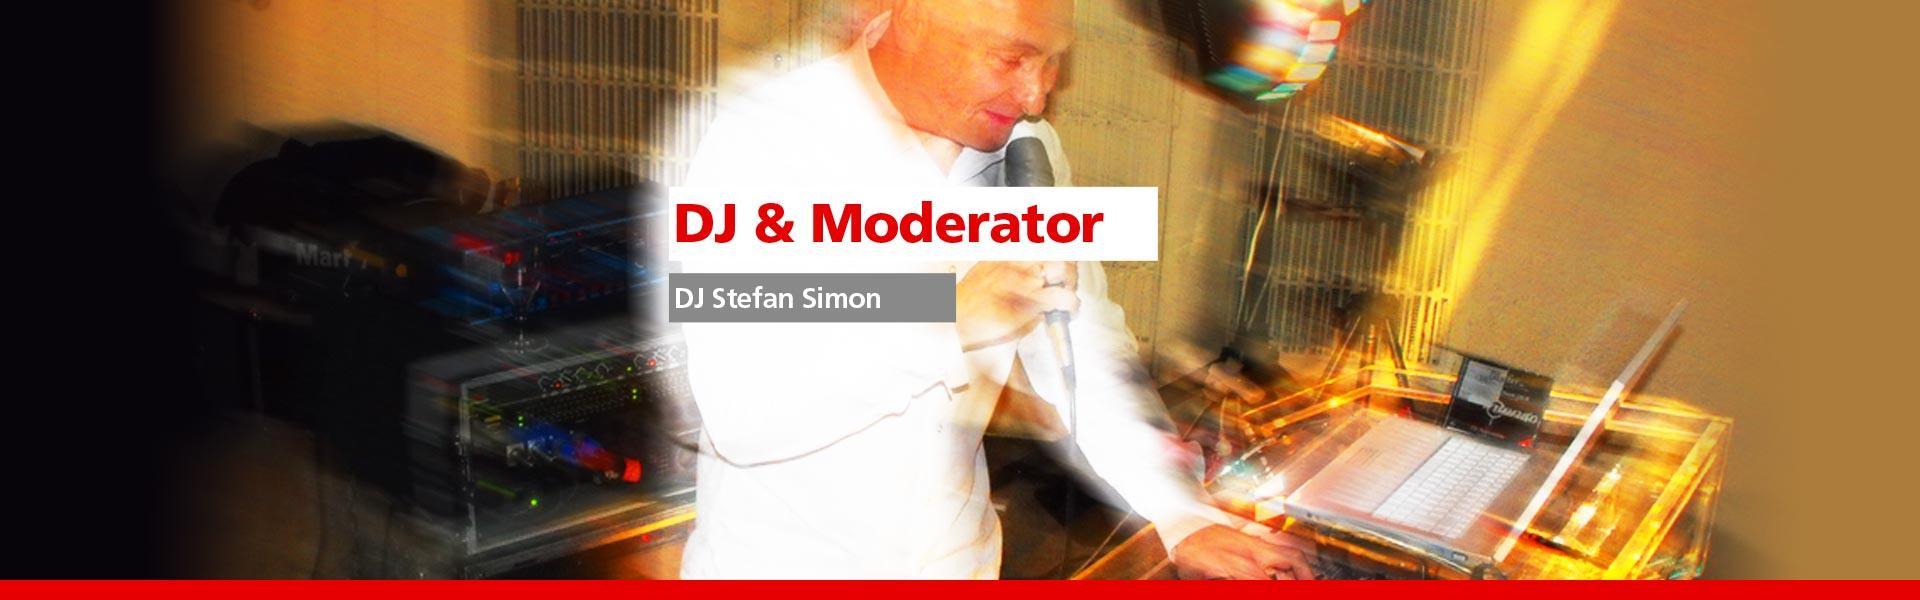 https://www.simonevents.de/wp-content/uploads/2014/02/Slider_1920x600px_MobilDJ-NEU-1.jpg